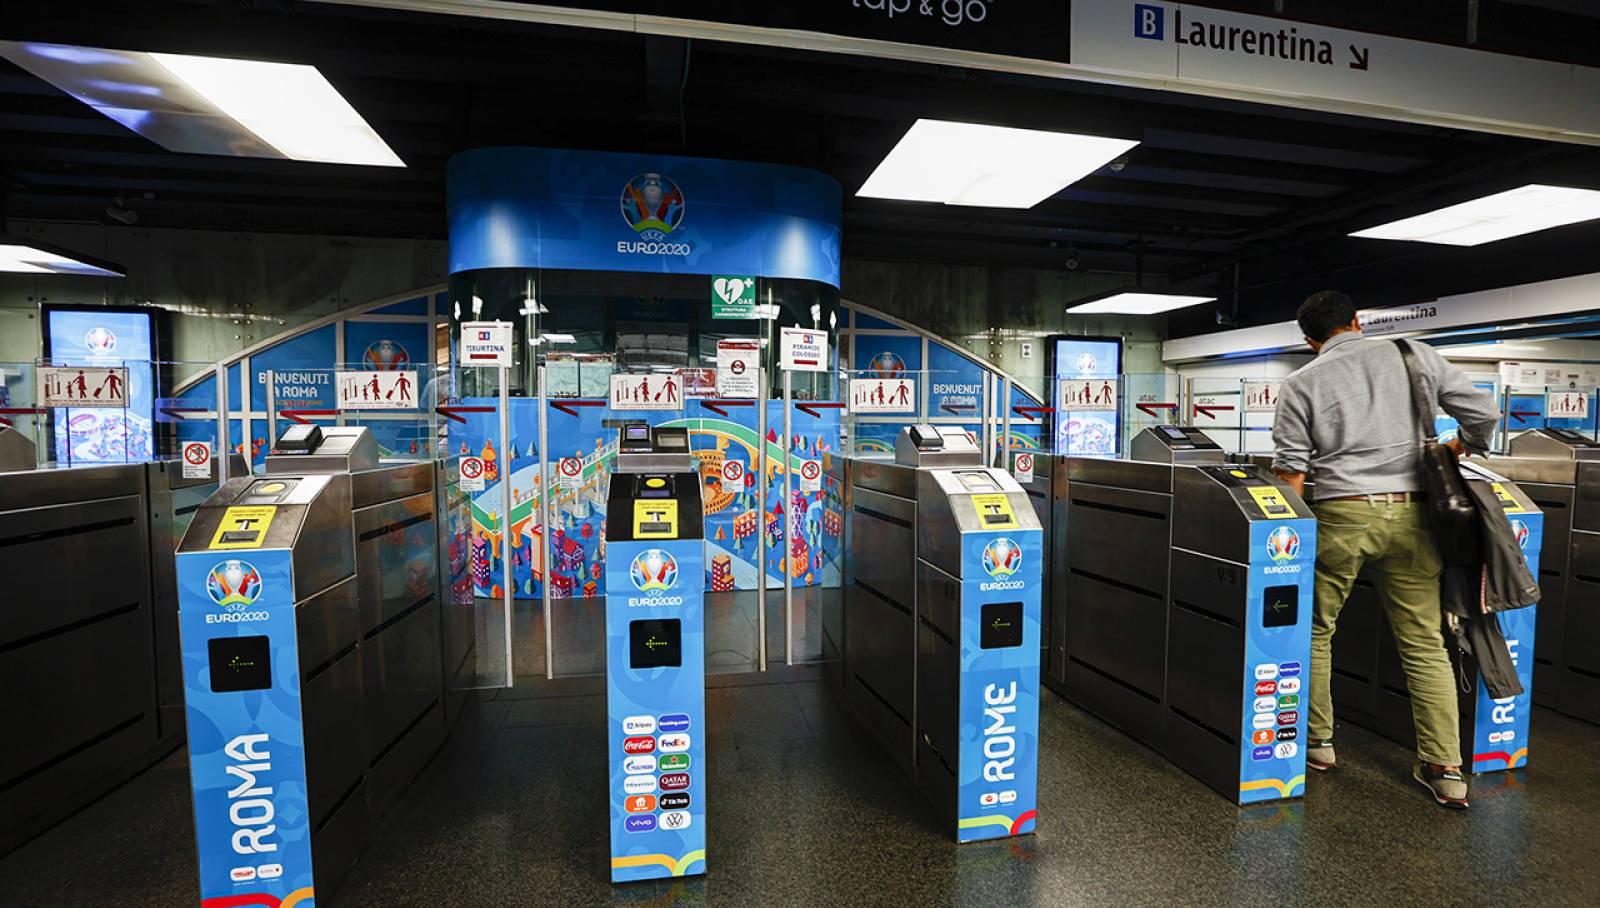 Pubblicità in metropolitana a Roma Termini IGPDecaux Station Domination per UEFA 2020